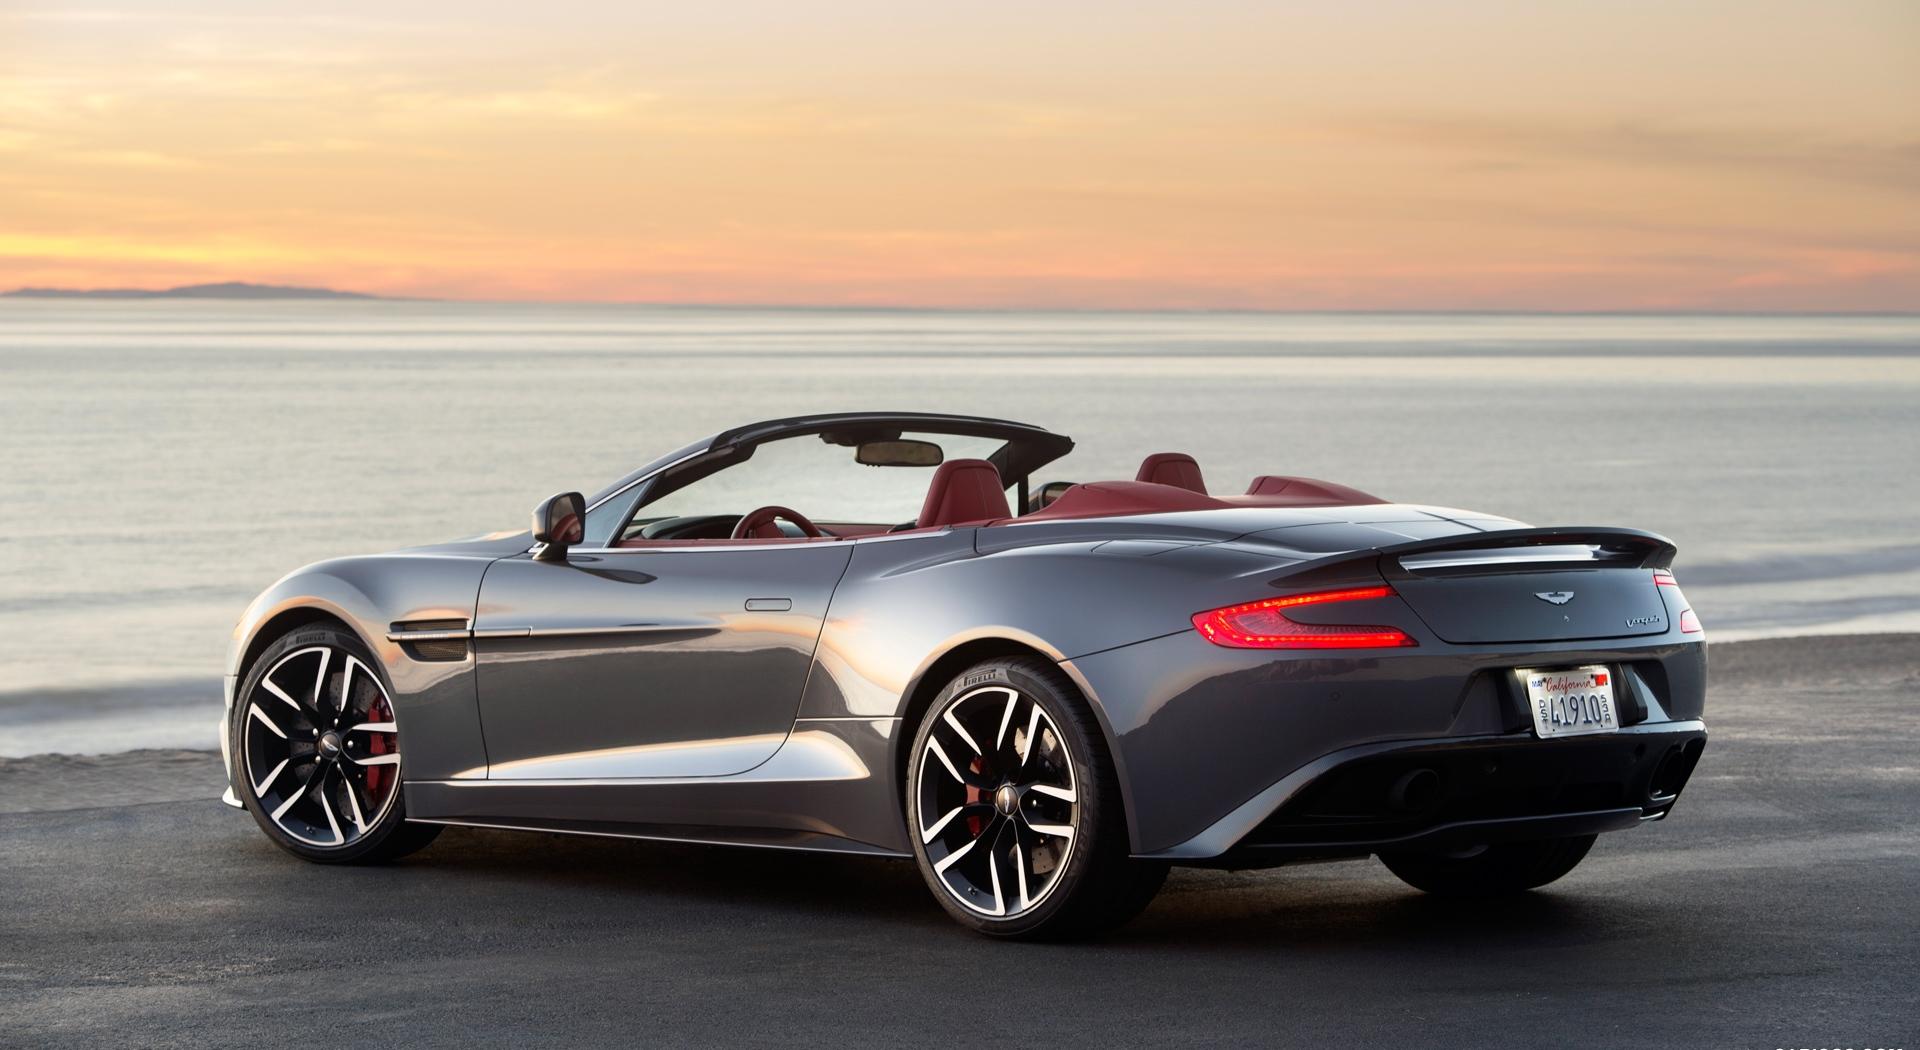 Aston Martin Vanquish Wallpapers hd